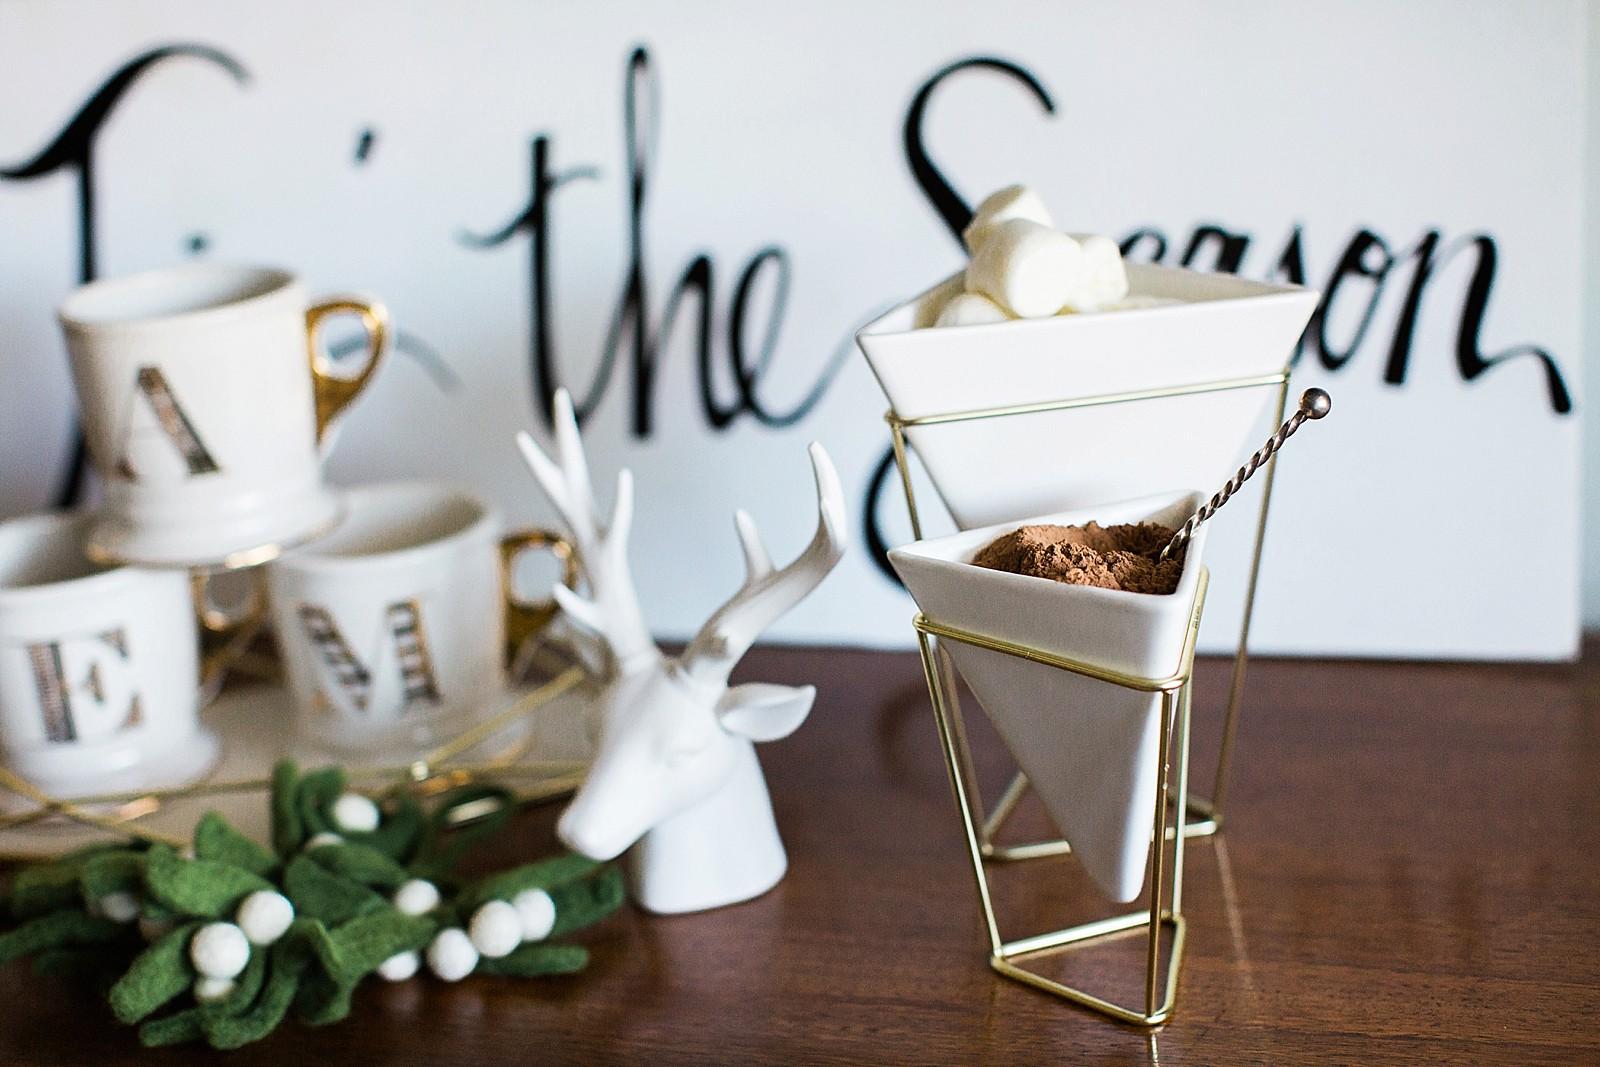 umbra-diana-elizabeth-modern-glam-christmas-decor-gift-giving-frame-ideas-3005